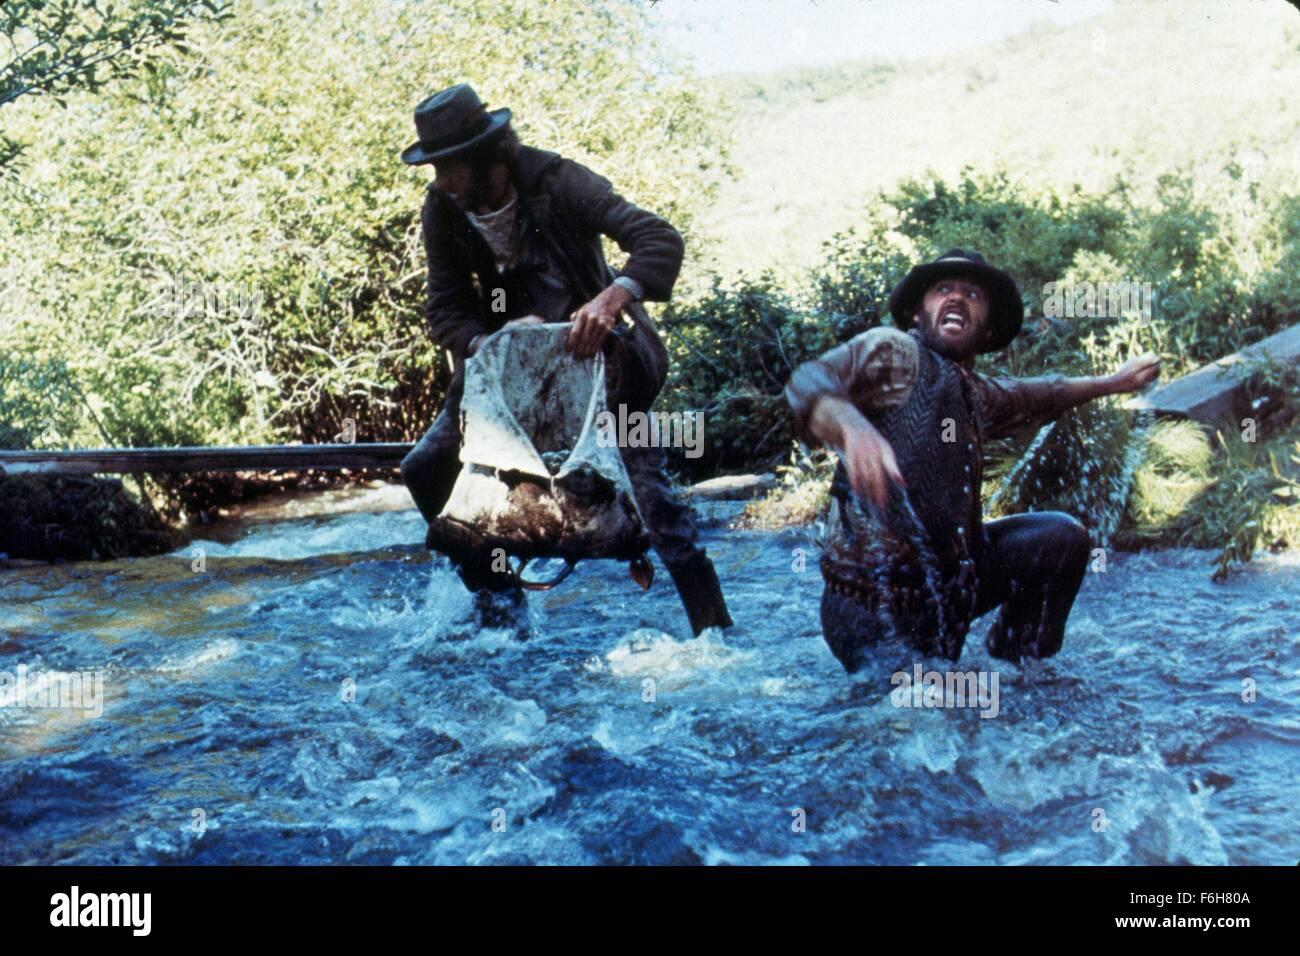 1976, Film Title: MISSOURI BREAKS, Pictured: BEARD, COWBOY, FIGHTING, HAT, MOUSTACHE, JACK NICHOLSON. (Credit Image: - Stock Image